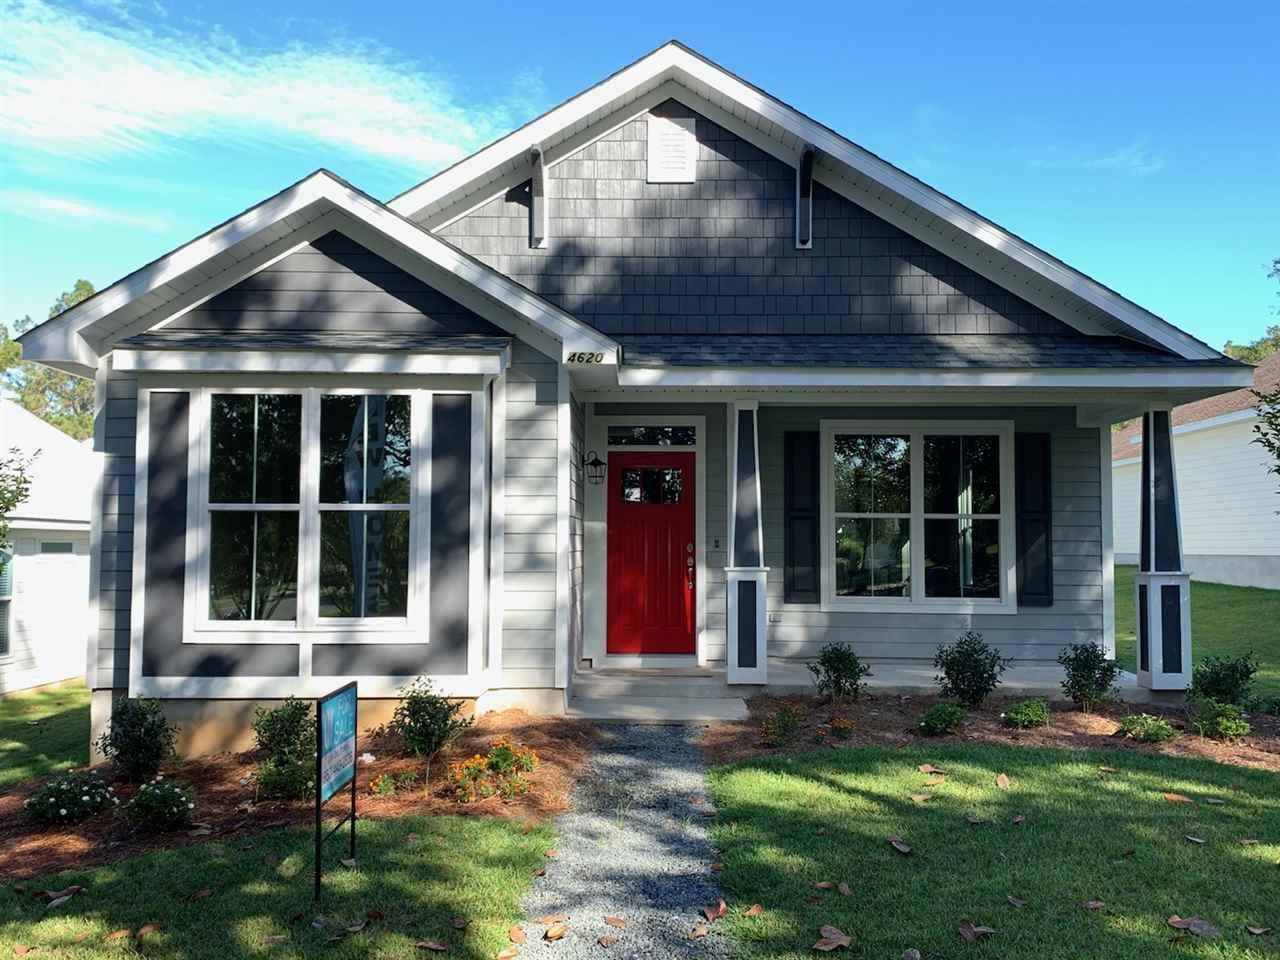 Property ID 312022